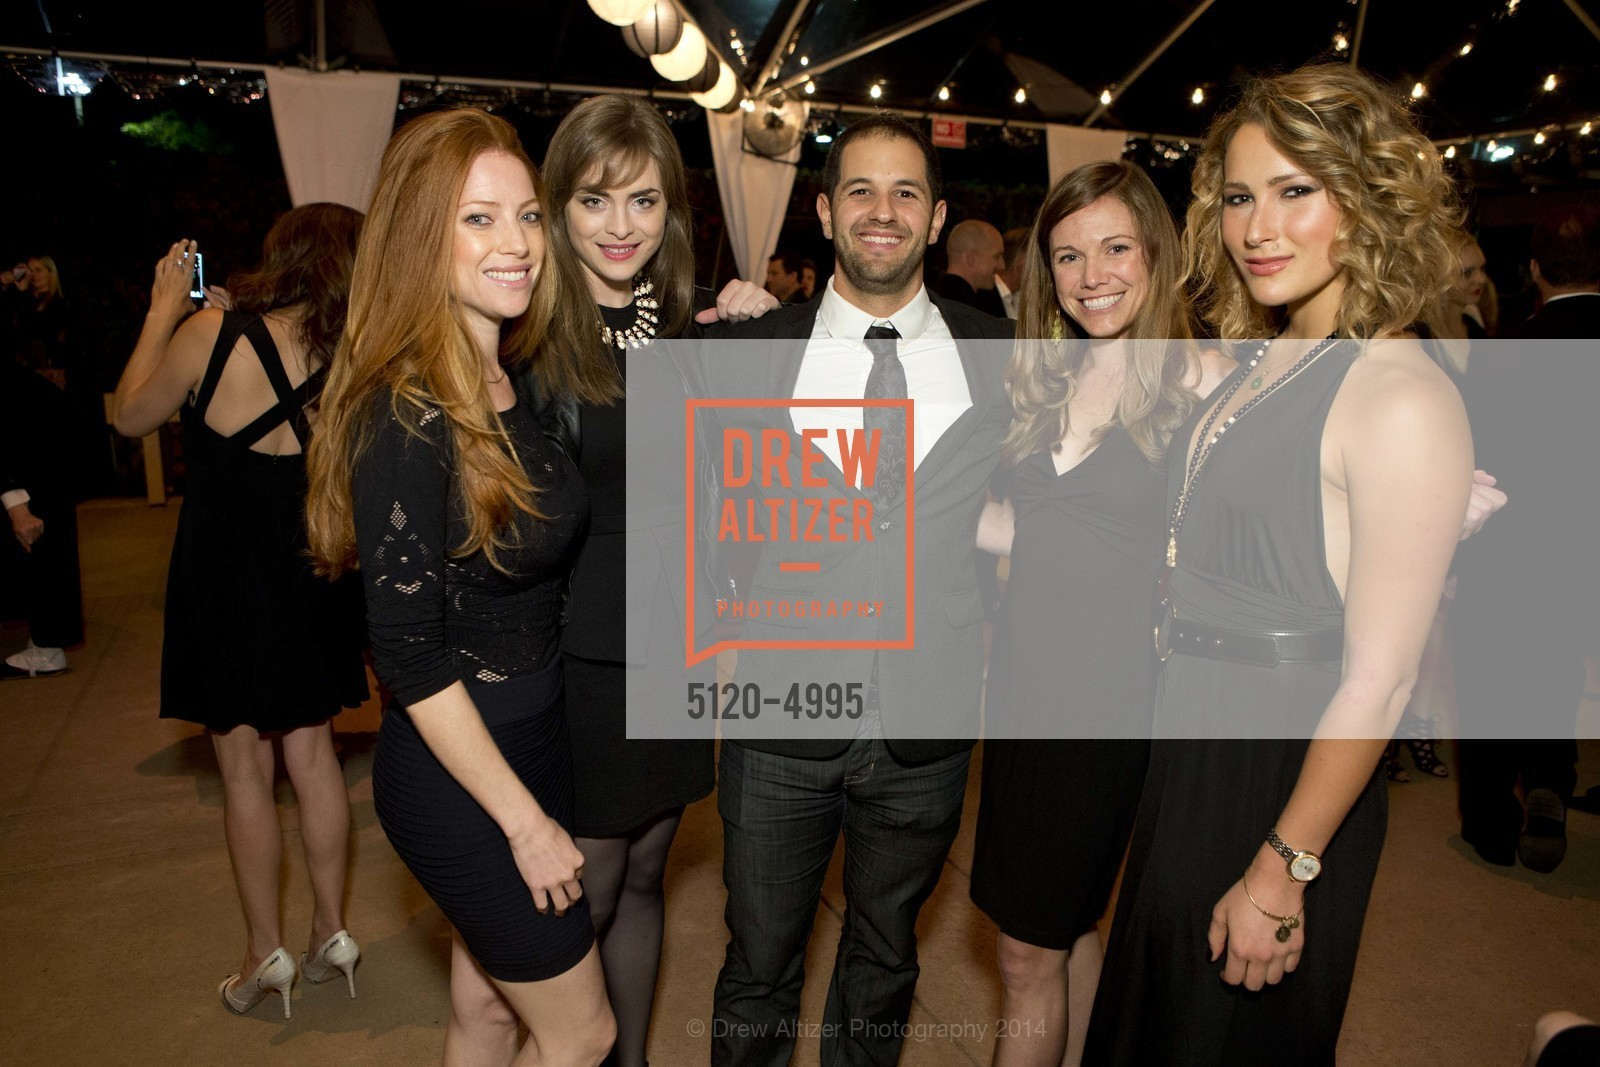 Lauren Ramsay, Isabelle, Jaron Eliopoulos, Jessica Thompson, Svetlana Kolesnikova, Photo #5120-4995